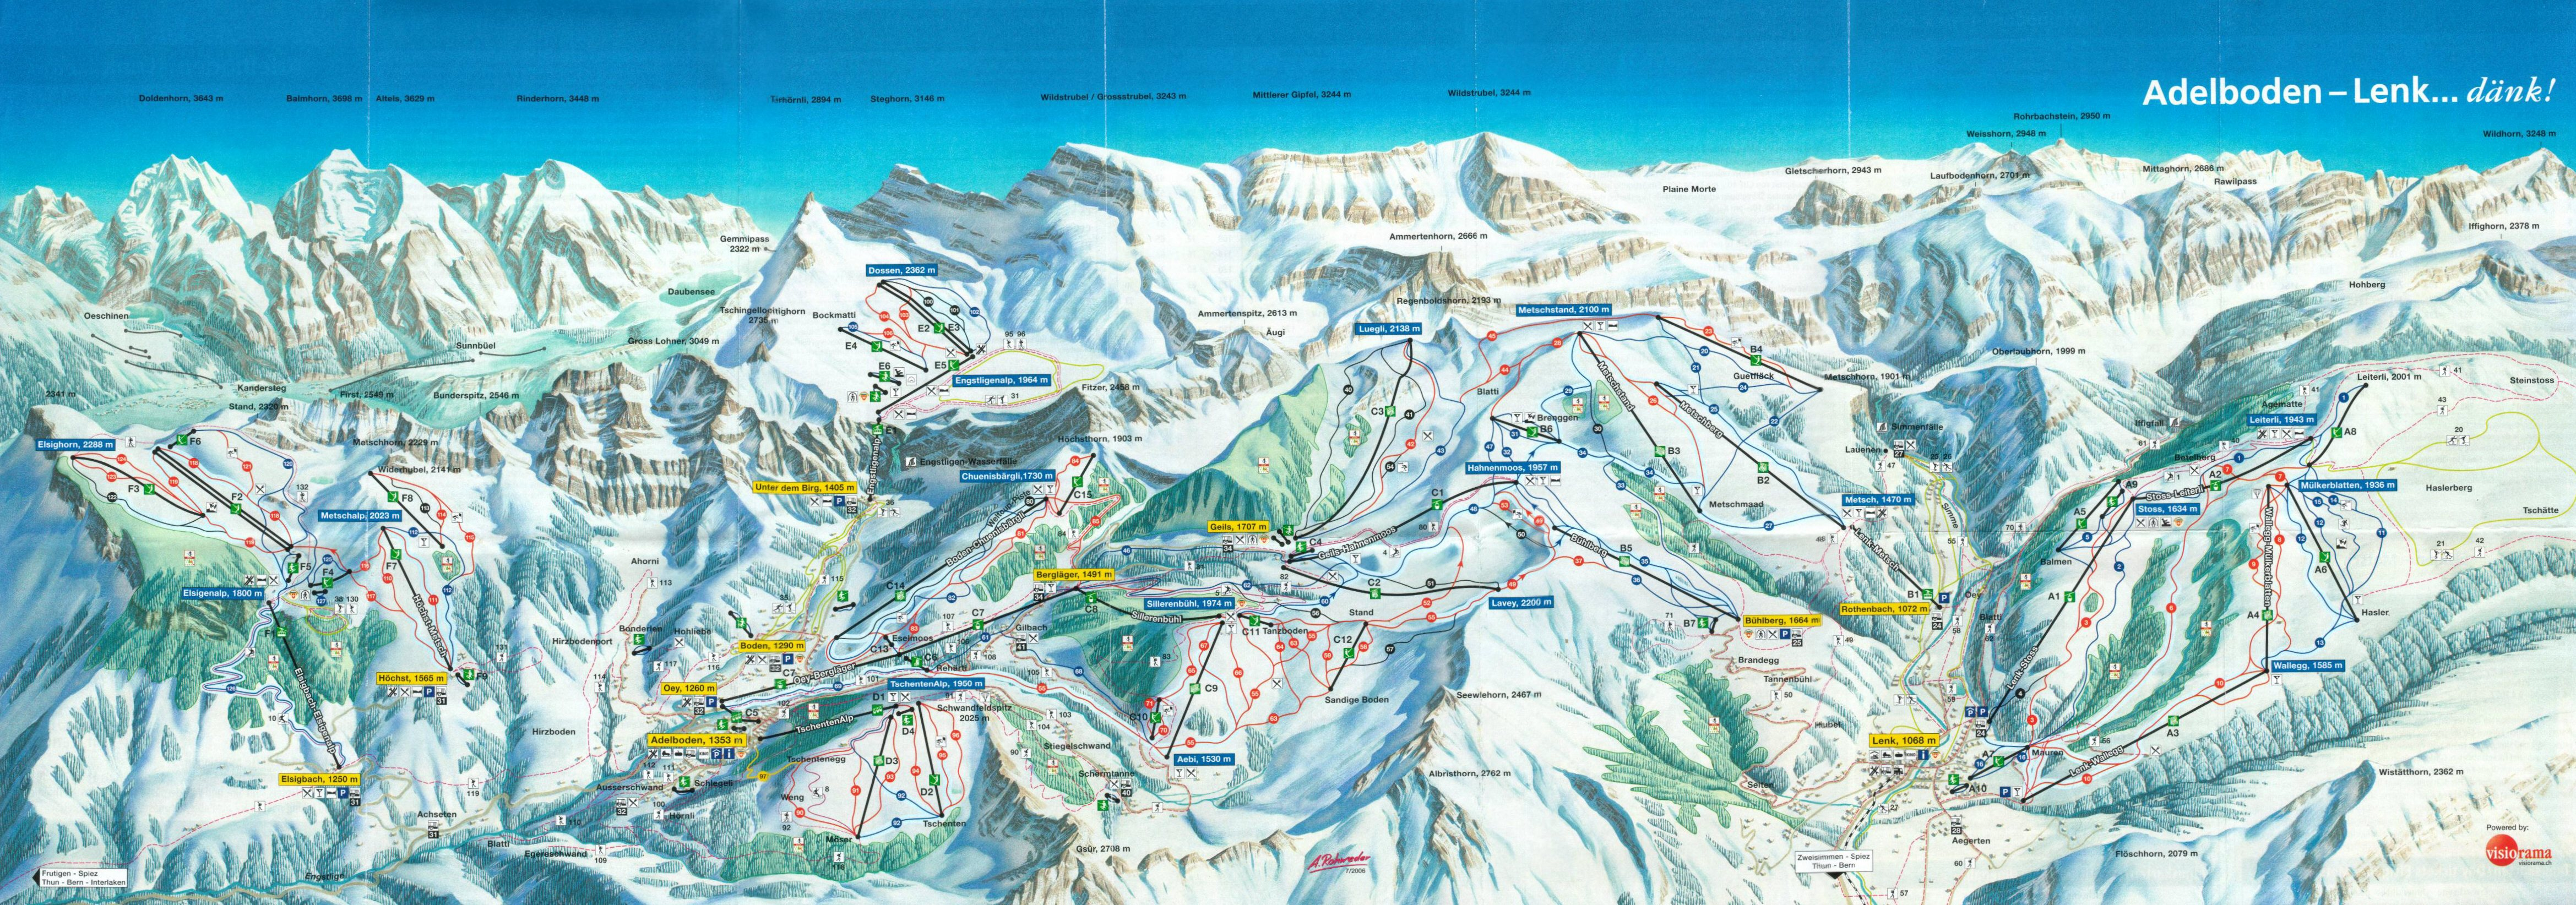 Adelboden Lenk Ski Map Berner Oberland Switzerland Europe